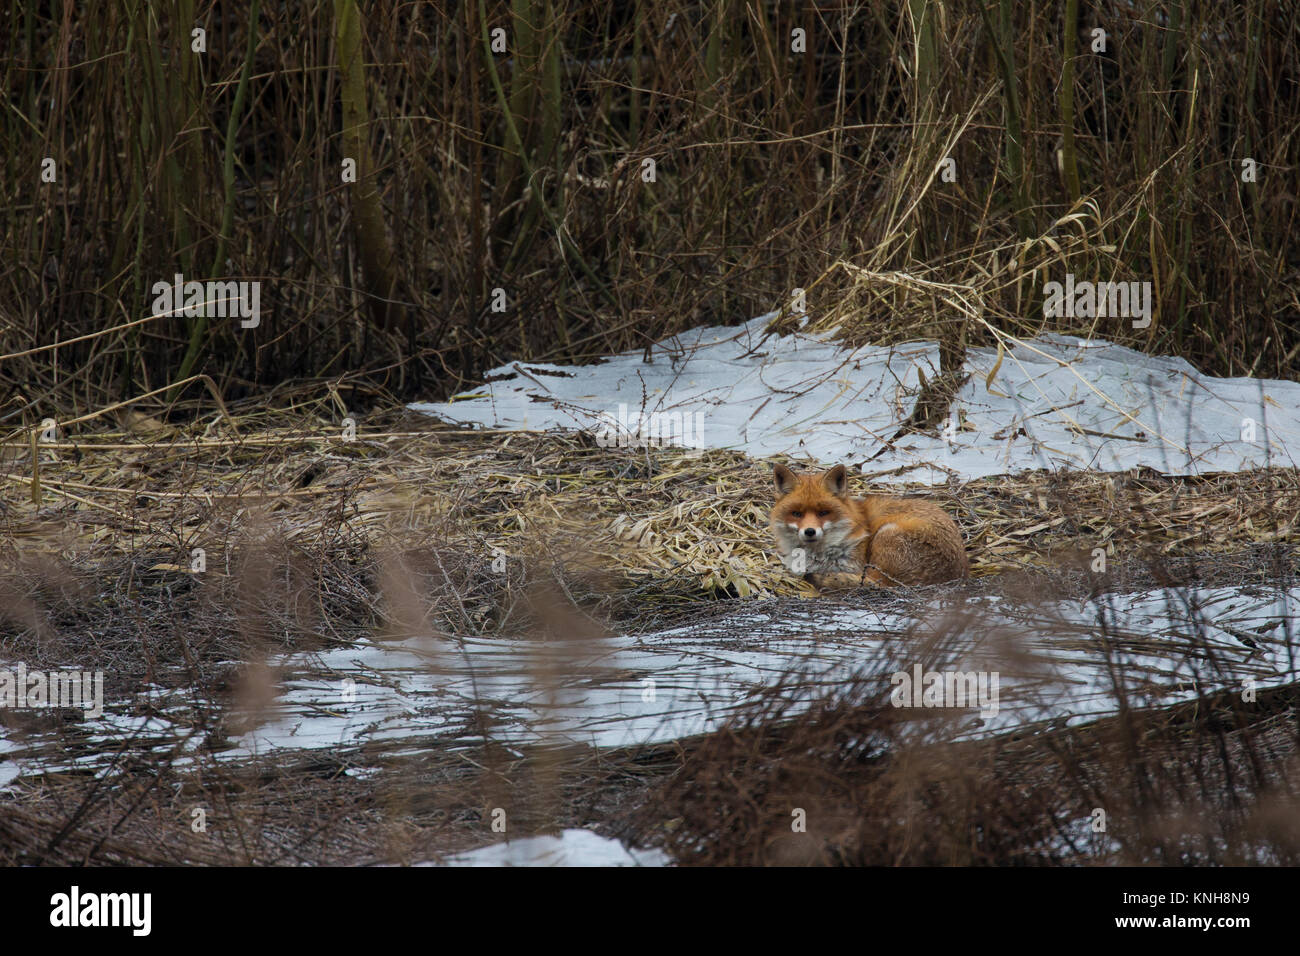 Rotfuchs, Rot-Fuchs, Fuchs, Vulpes vulpes, red fox - Stock Image